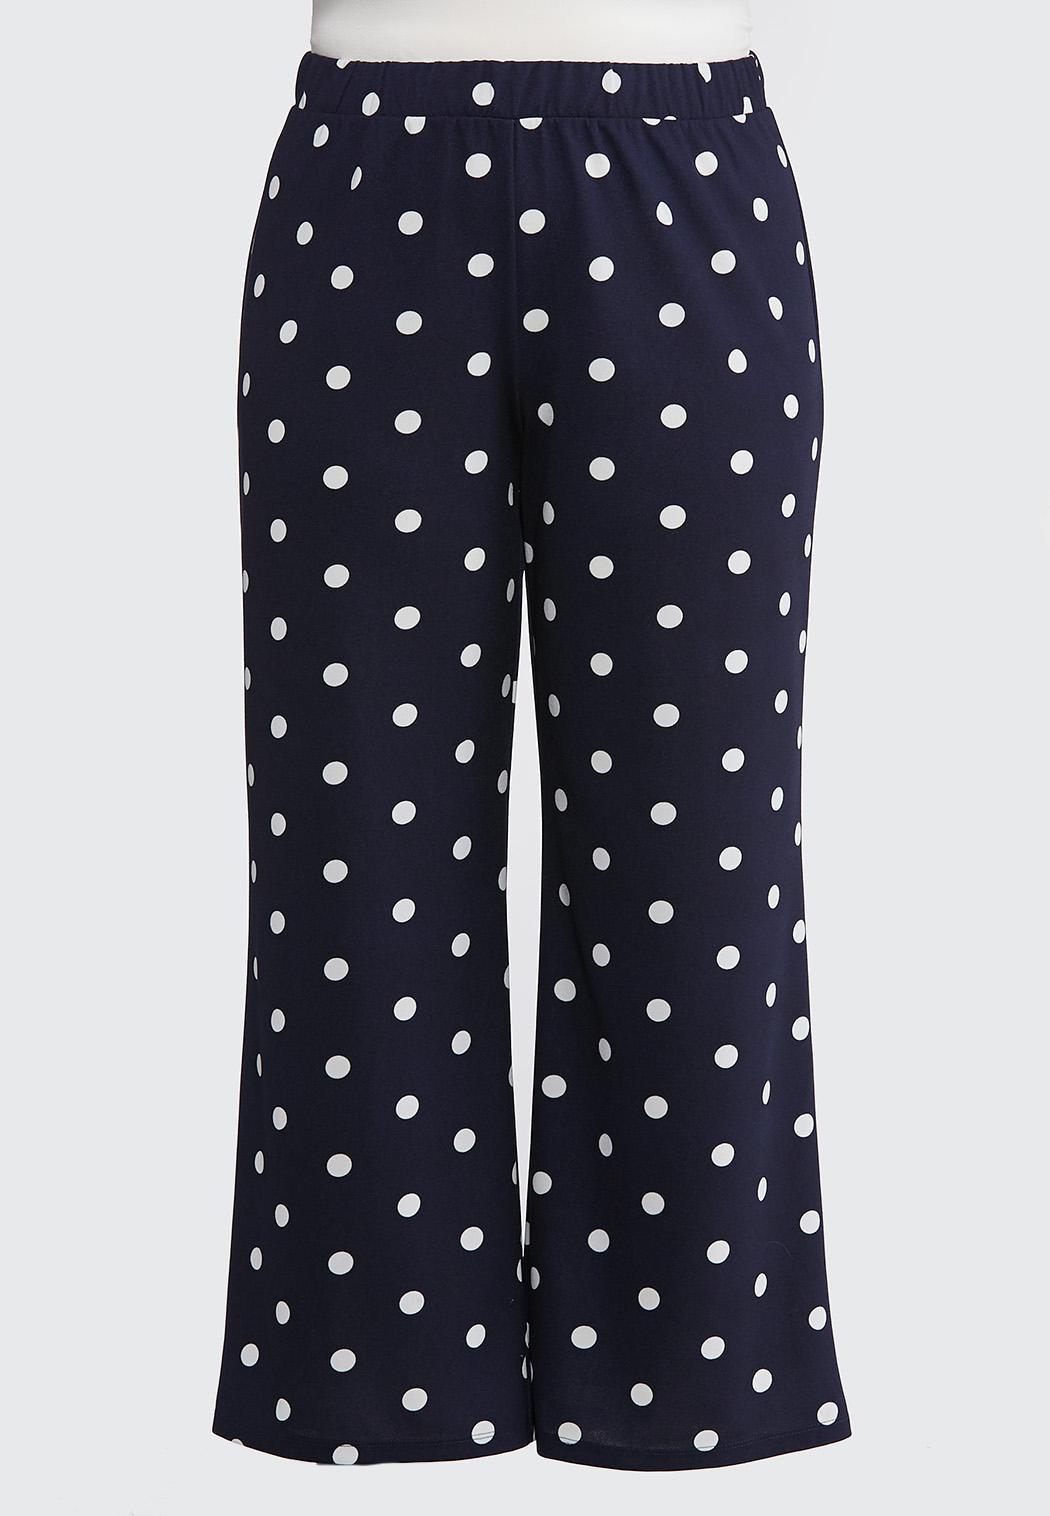 6592b3bce44 Plus Size Navy Polka Dot Palazzo Pants Wide Leg Cato Fashions